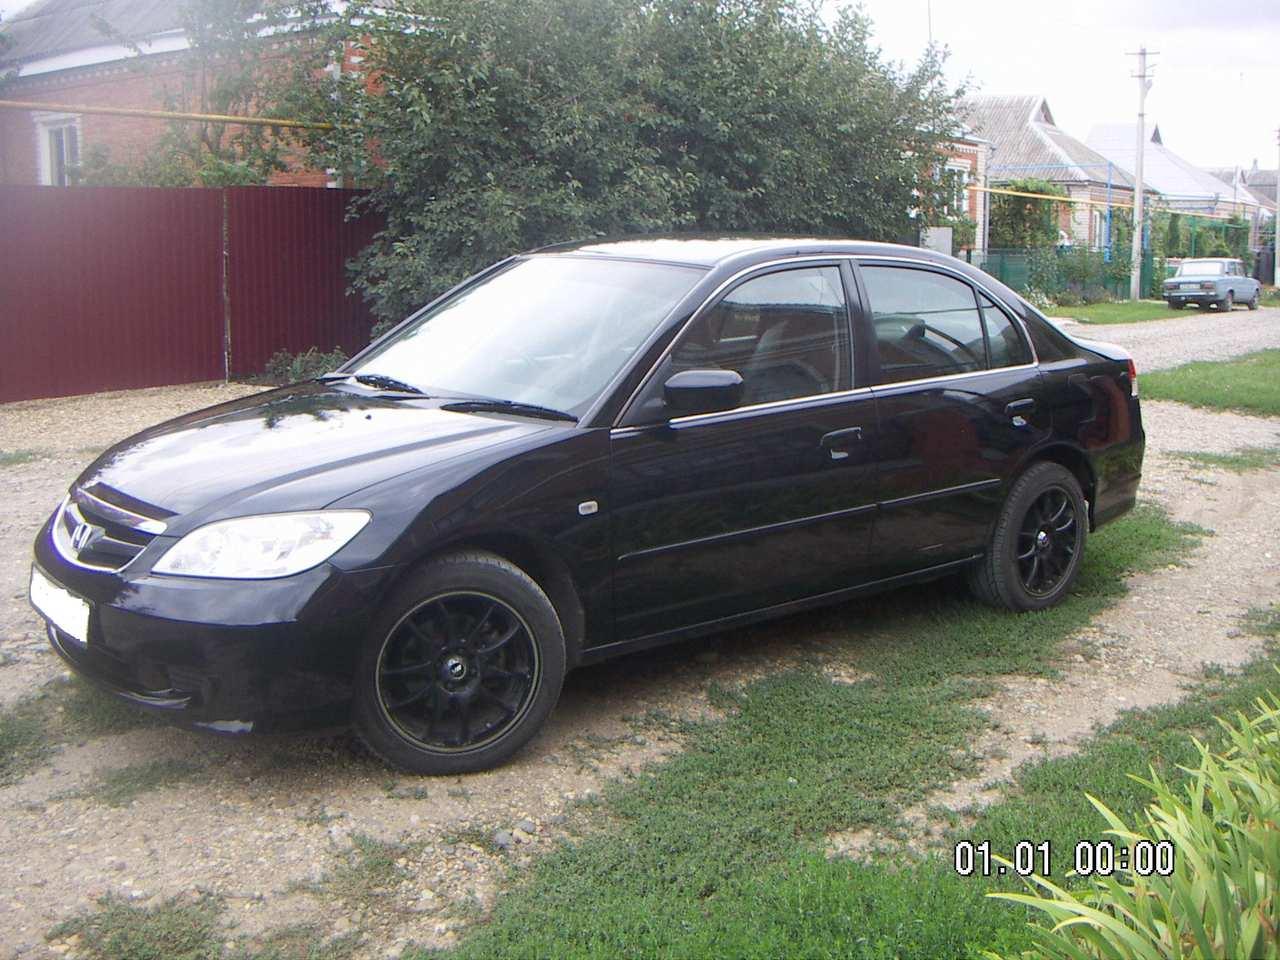 2003 honda civic for sale 1598cc gasoline ff for Honda civic overheating